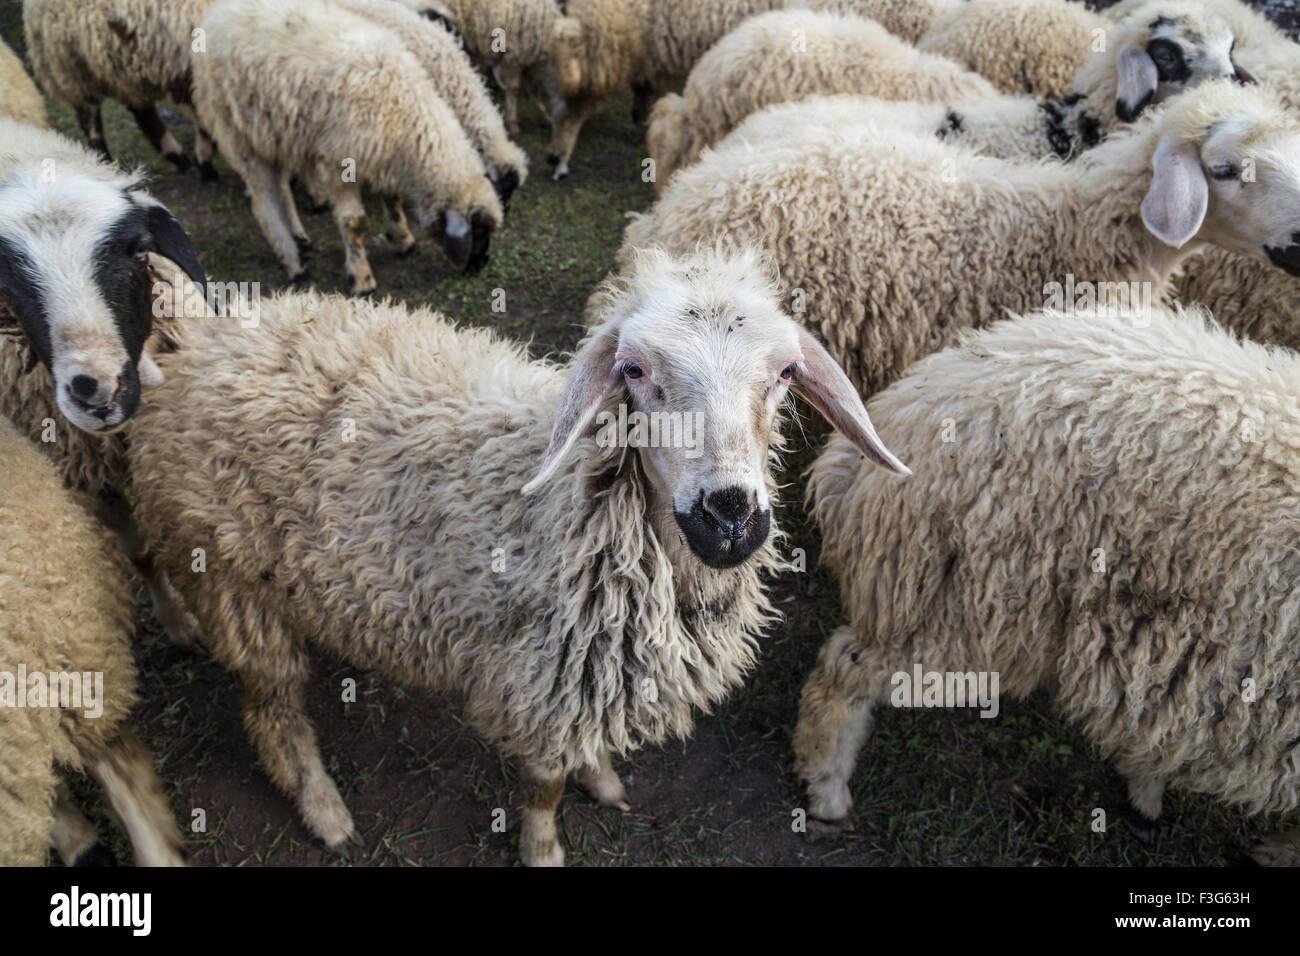 sheep (flocks) - Stock Image